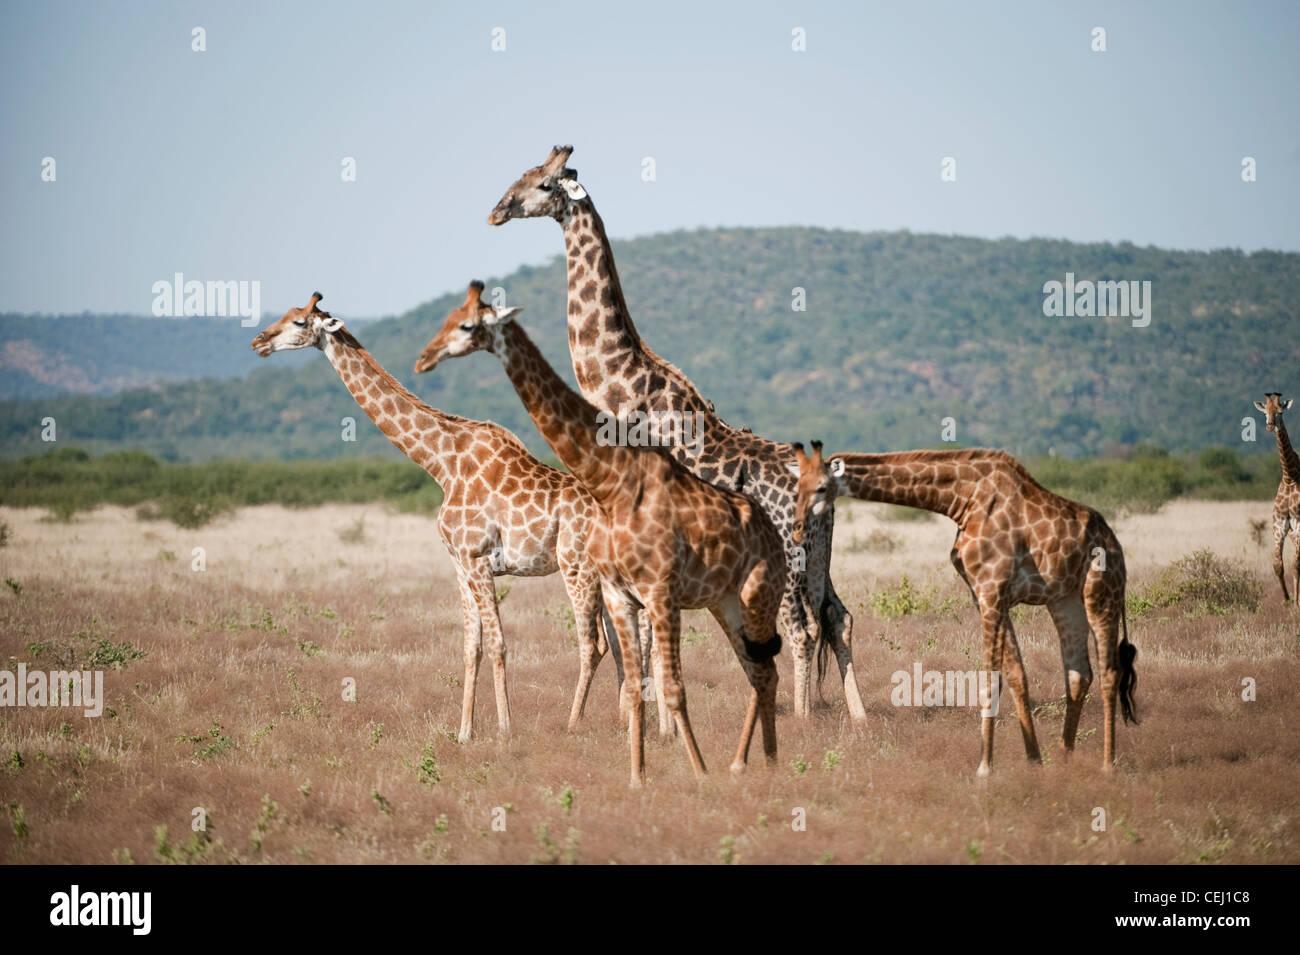 Allevamento di giraffe,Madikwe Game Lodge,nord ovest della provincia,nord ovest della provincia Immagini Stock